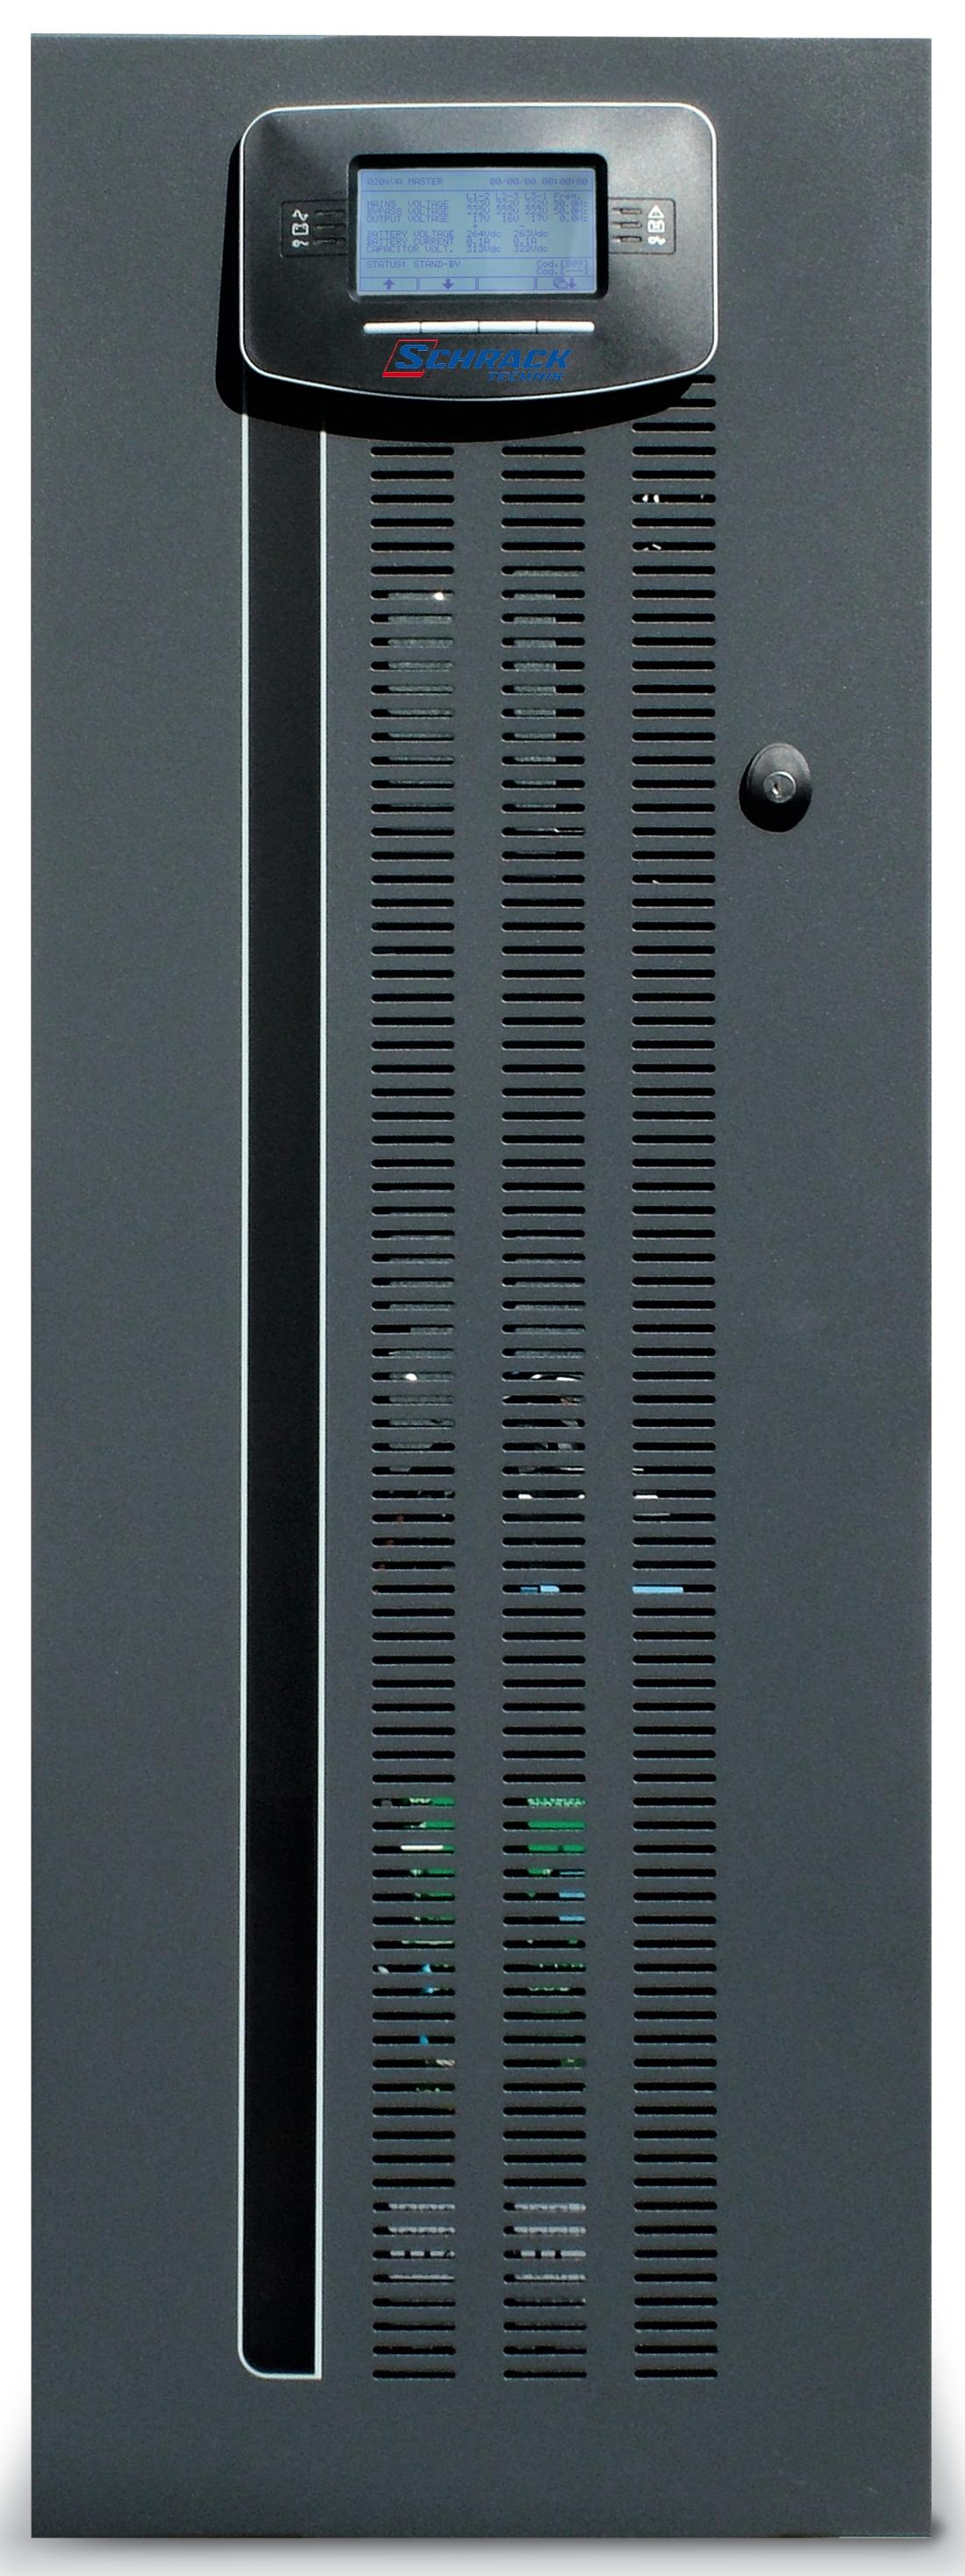 1 Stk USV AVARA Multi 12kVA 10,8kW 0Min.3ph/3ph /Online USMLT12XA0